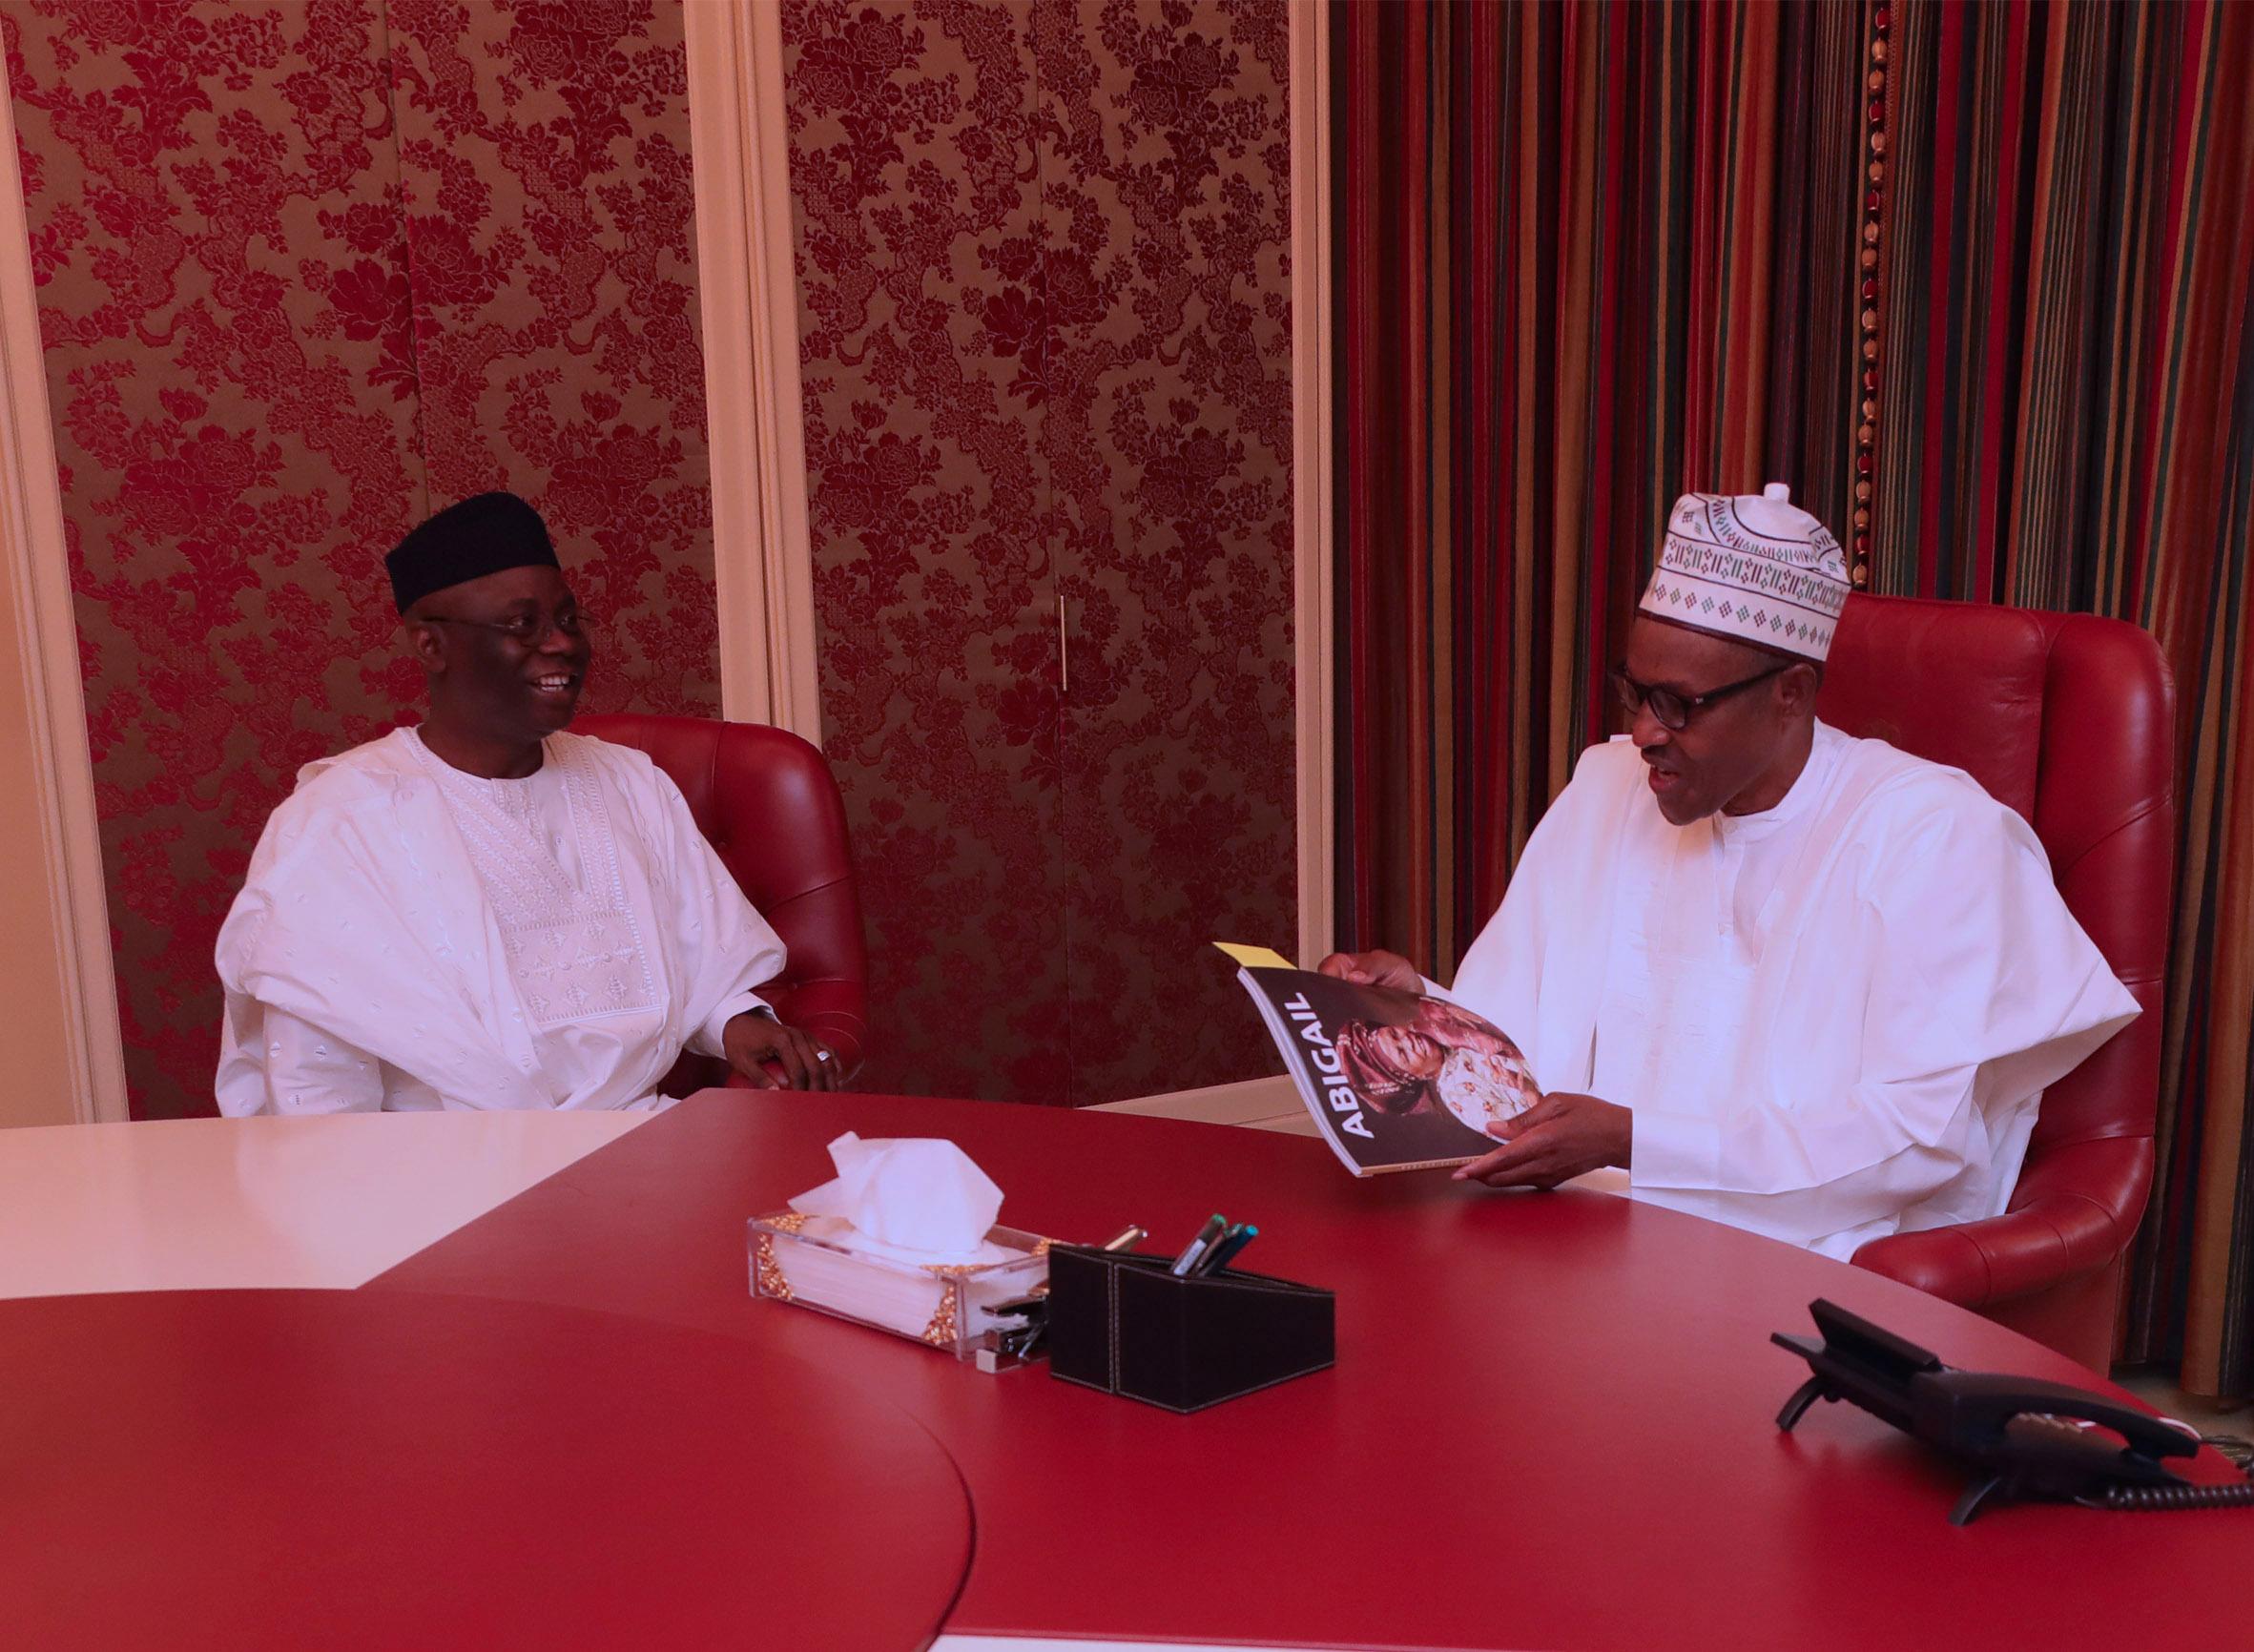 Presidency Denies Kemi Adeosun and Pastor Bakare Meeting With President Buhari